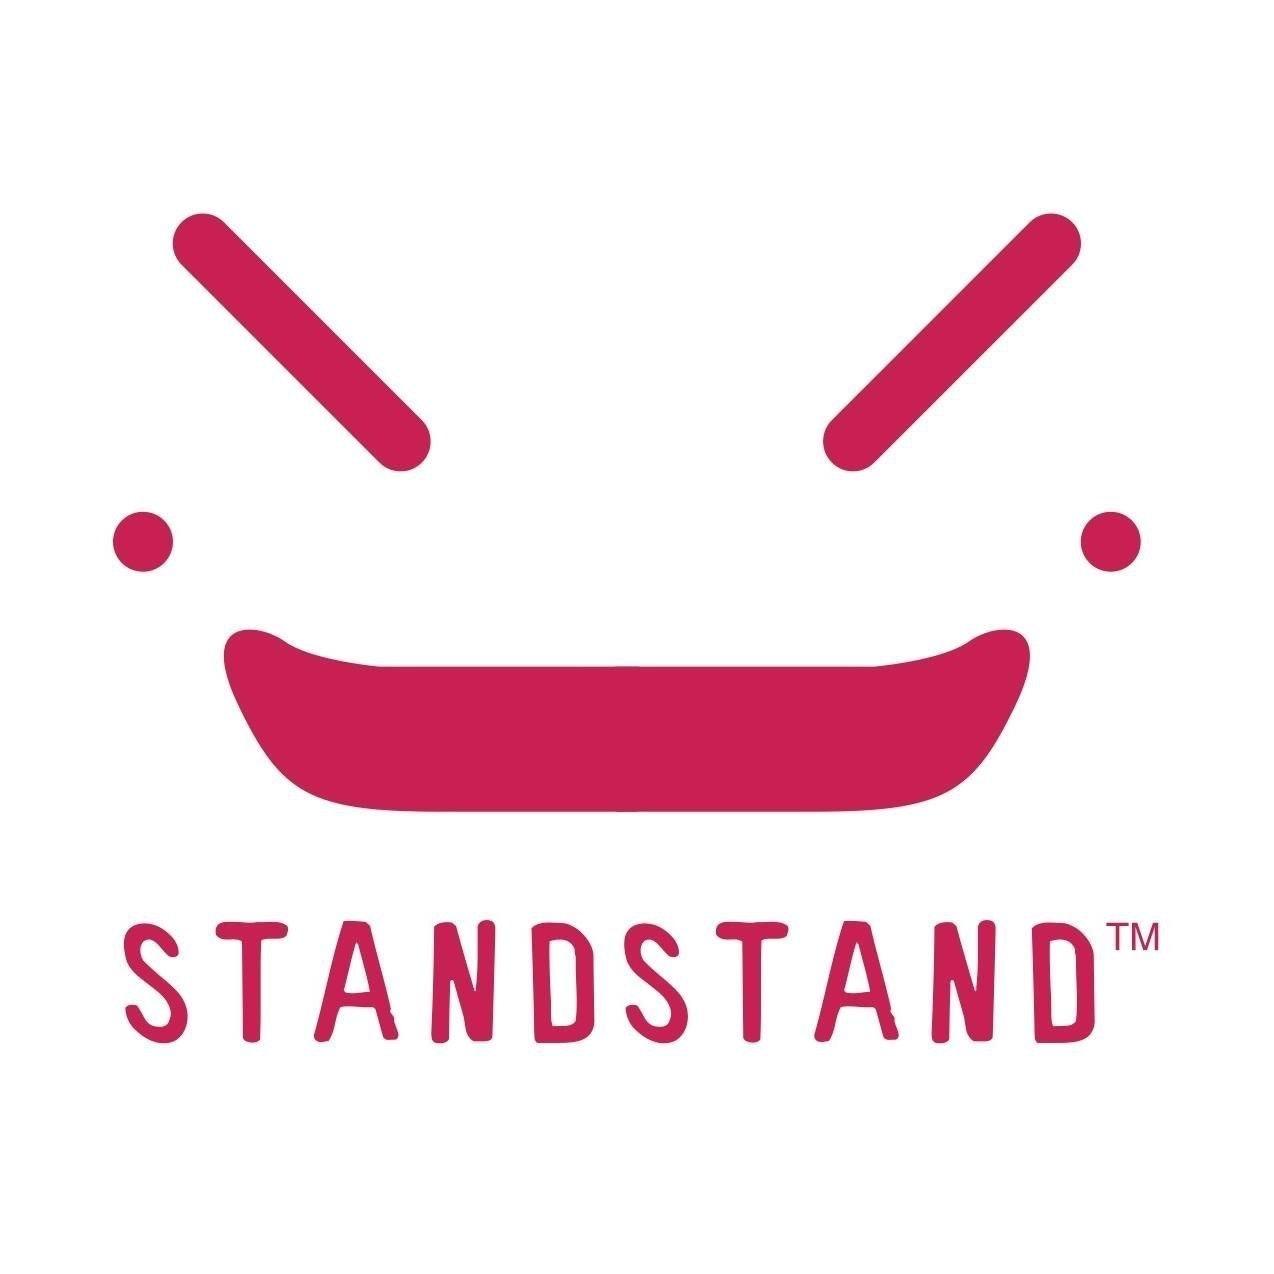 StandStand